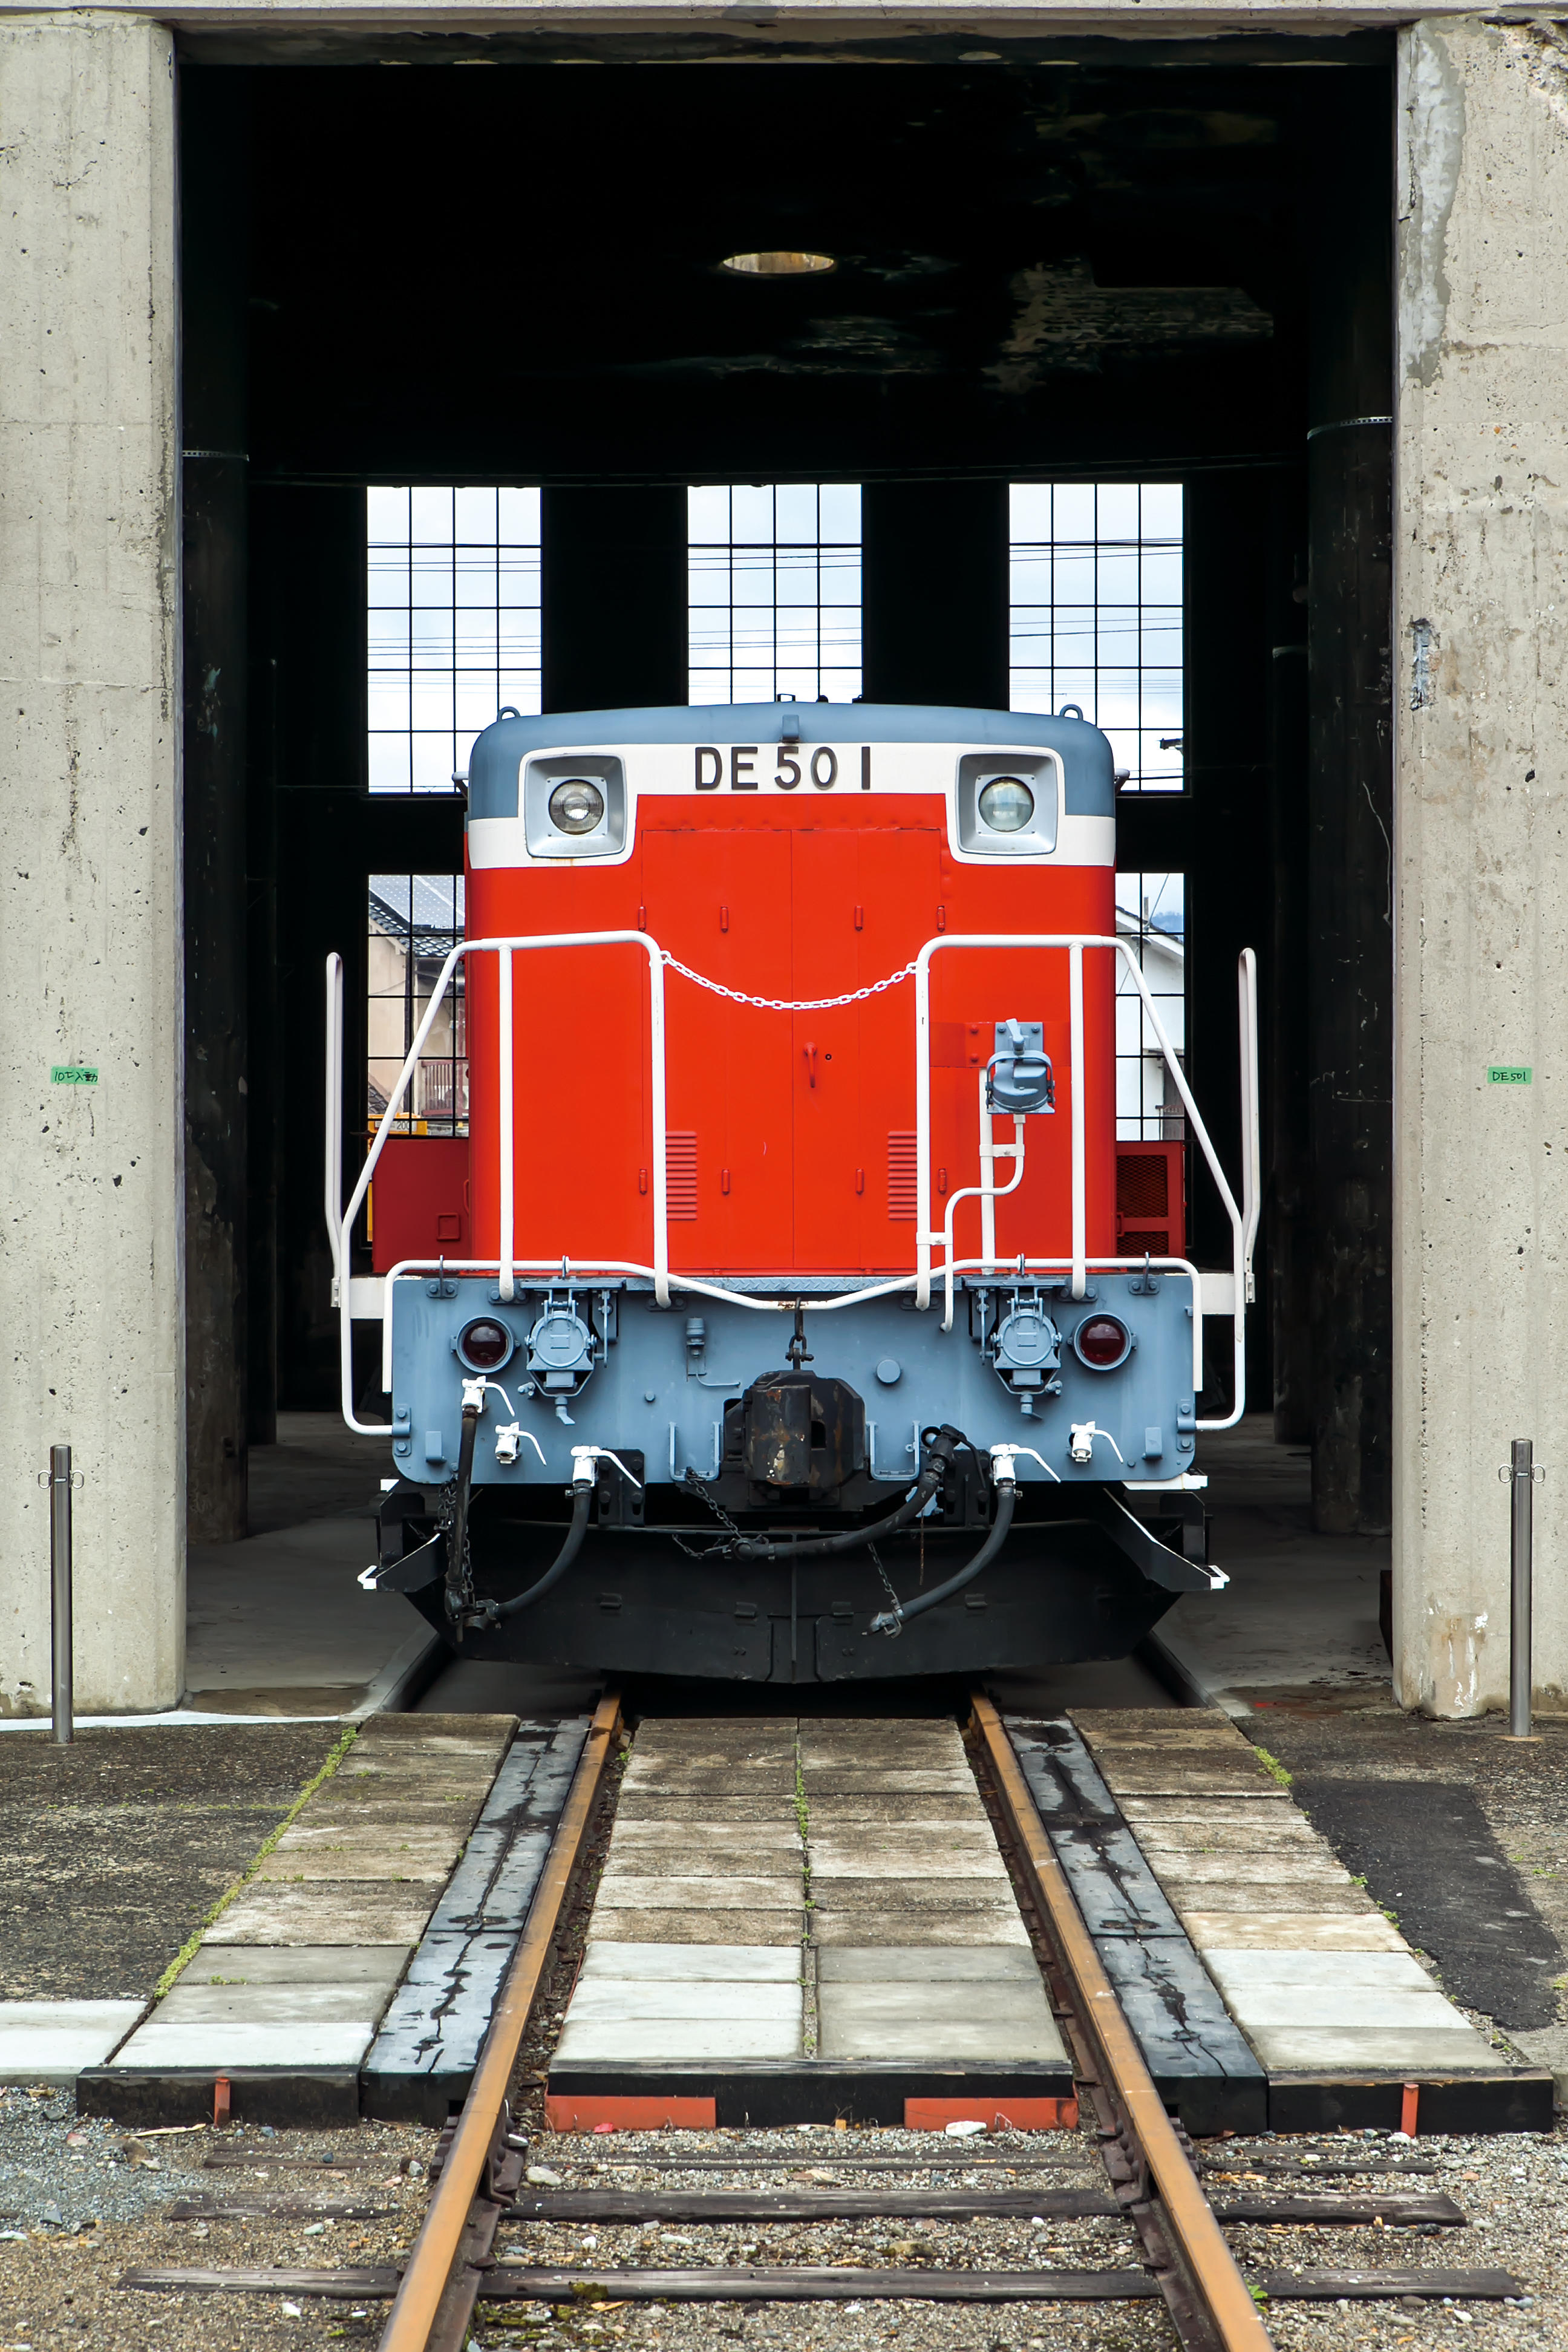 DE50形ディーゼル機関車1号機.jpg